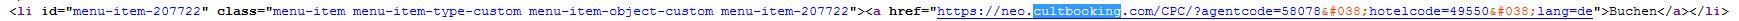 menu_cultbooking_url_developers